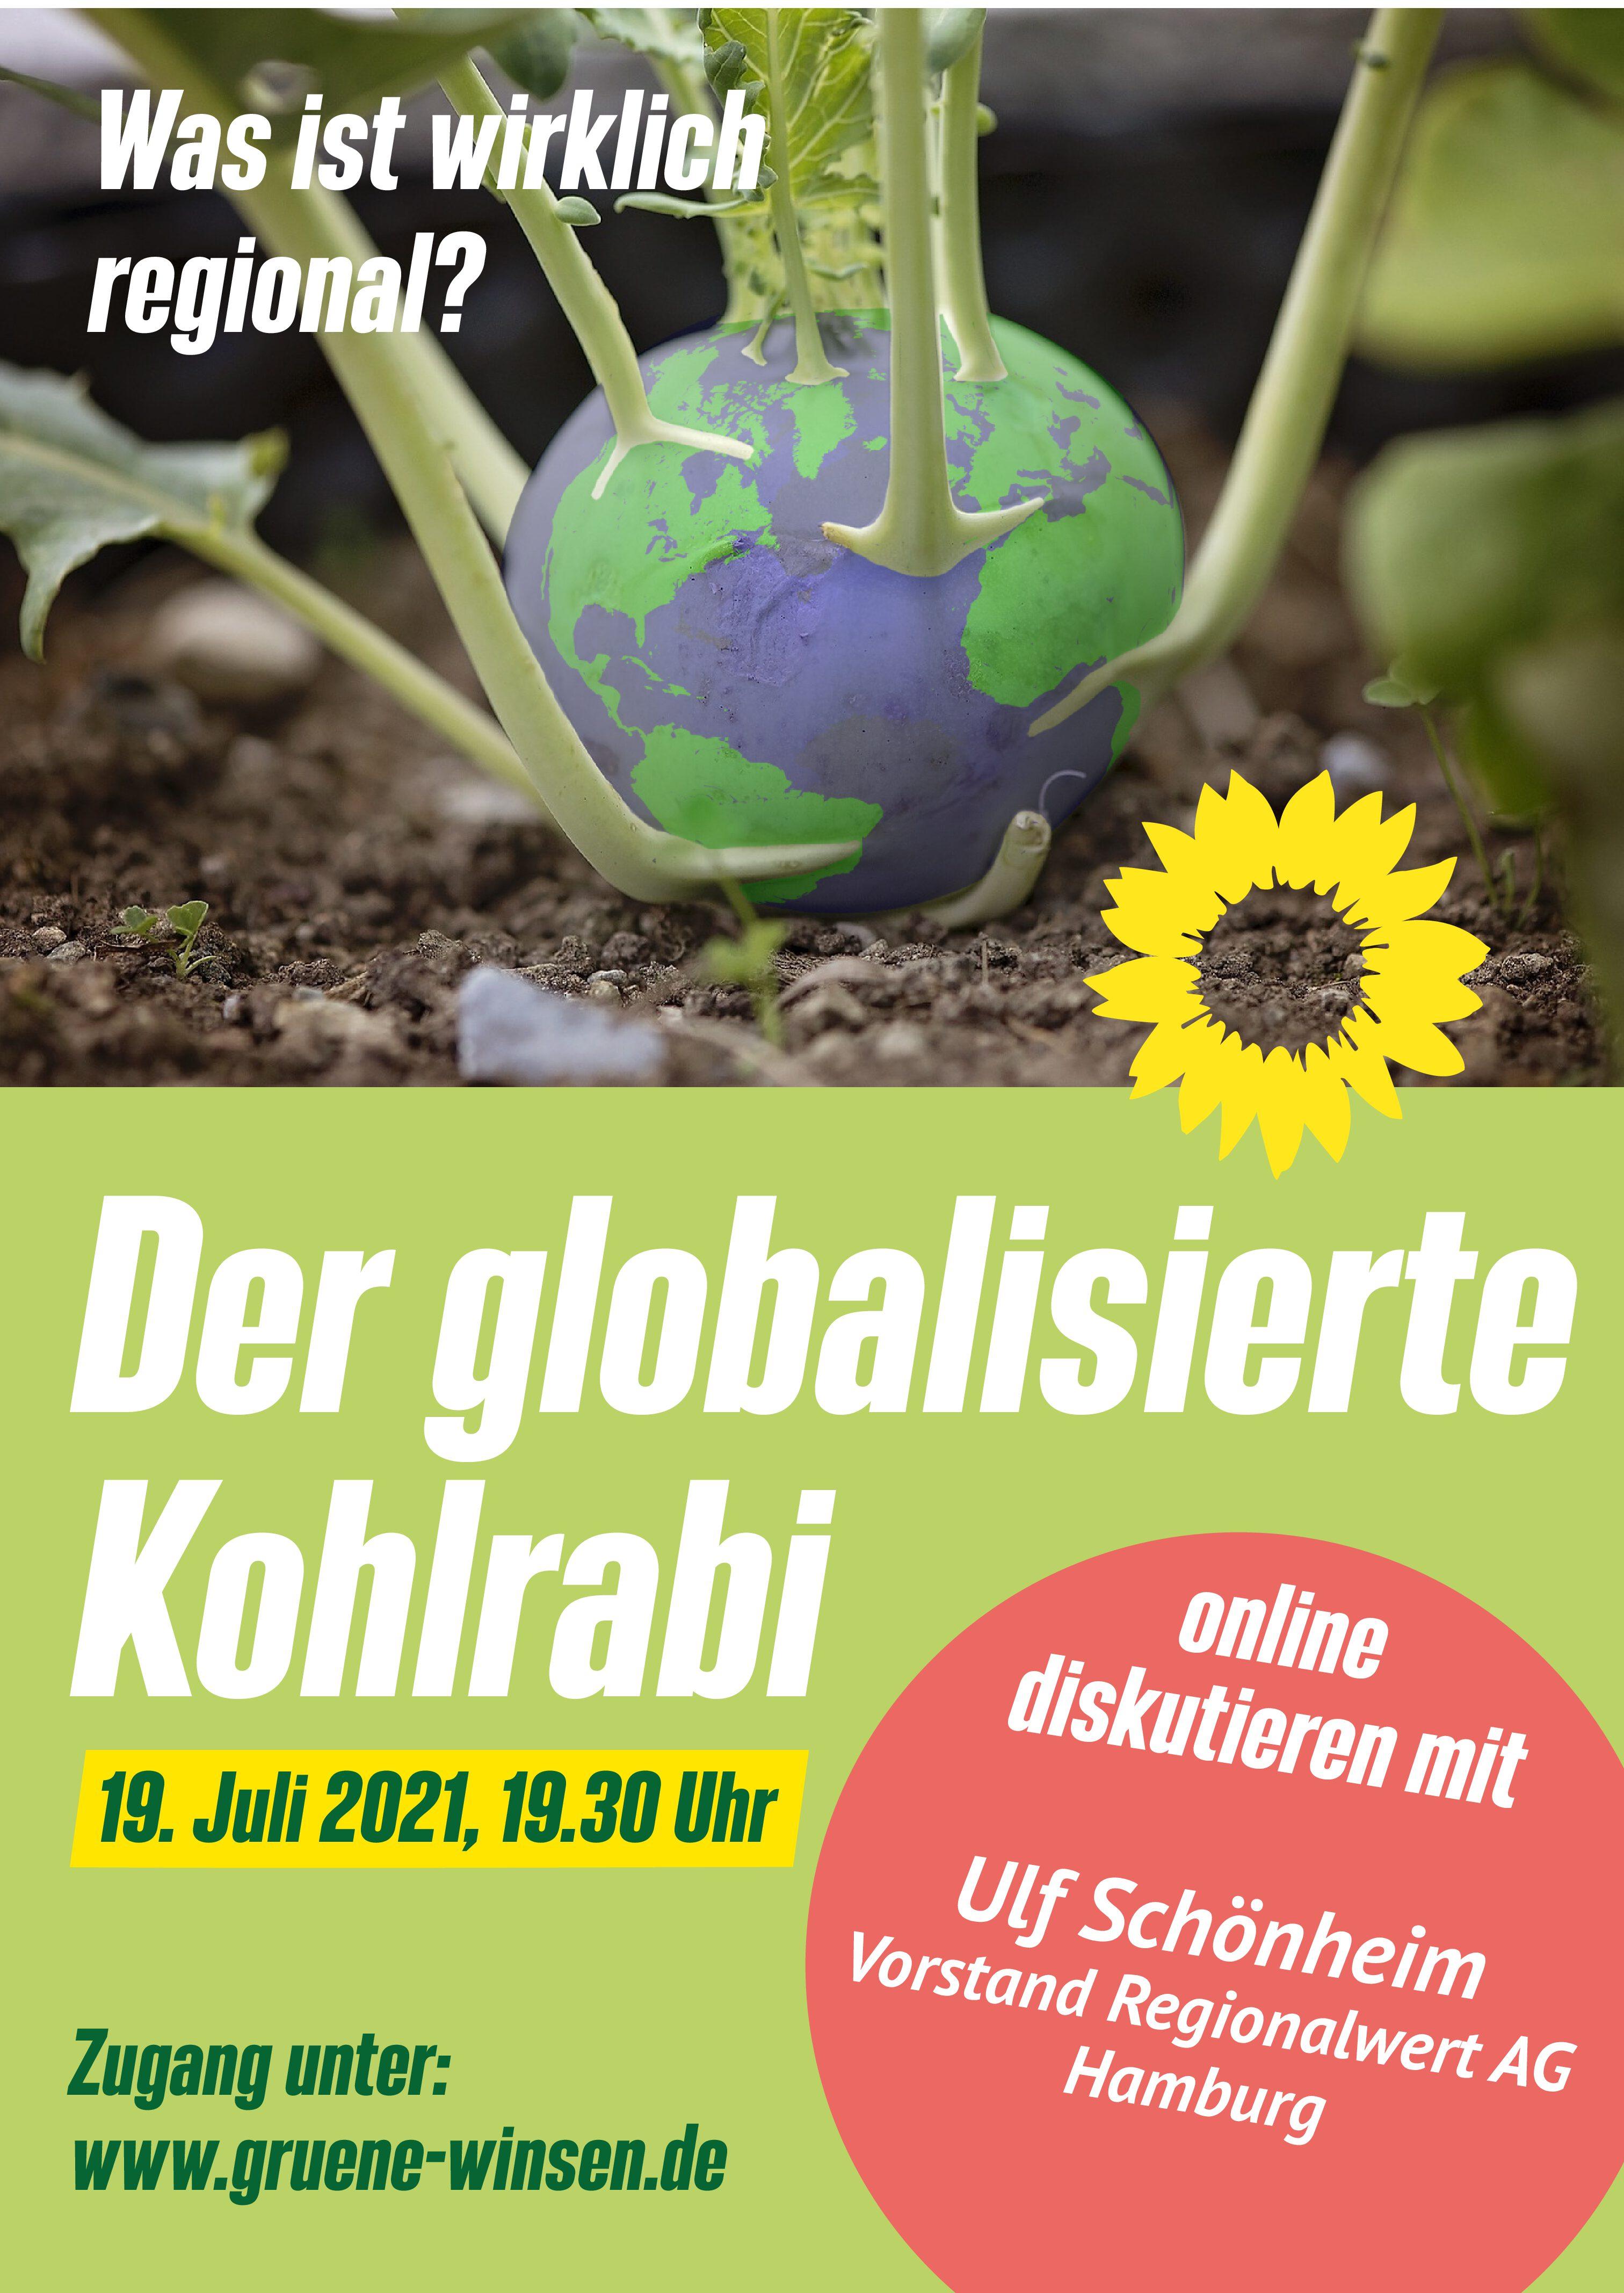 Der globalisierte Kohlrabi